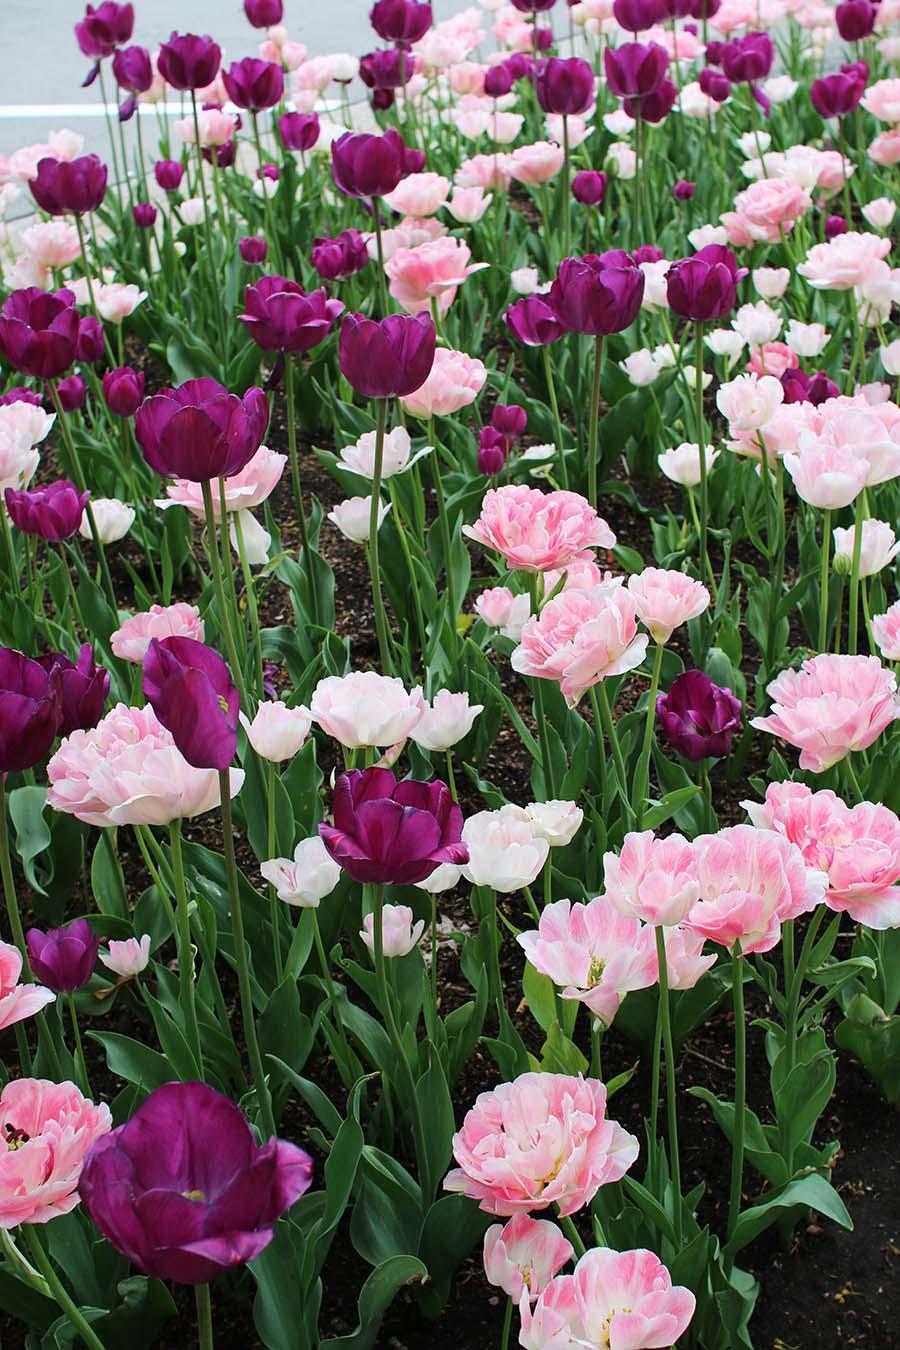 flowers-pink-an-purple-tulips